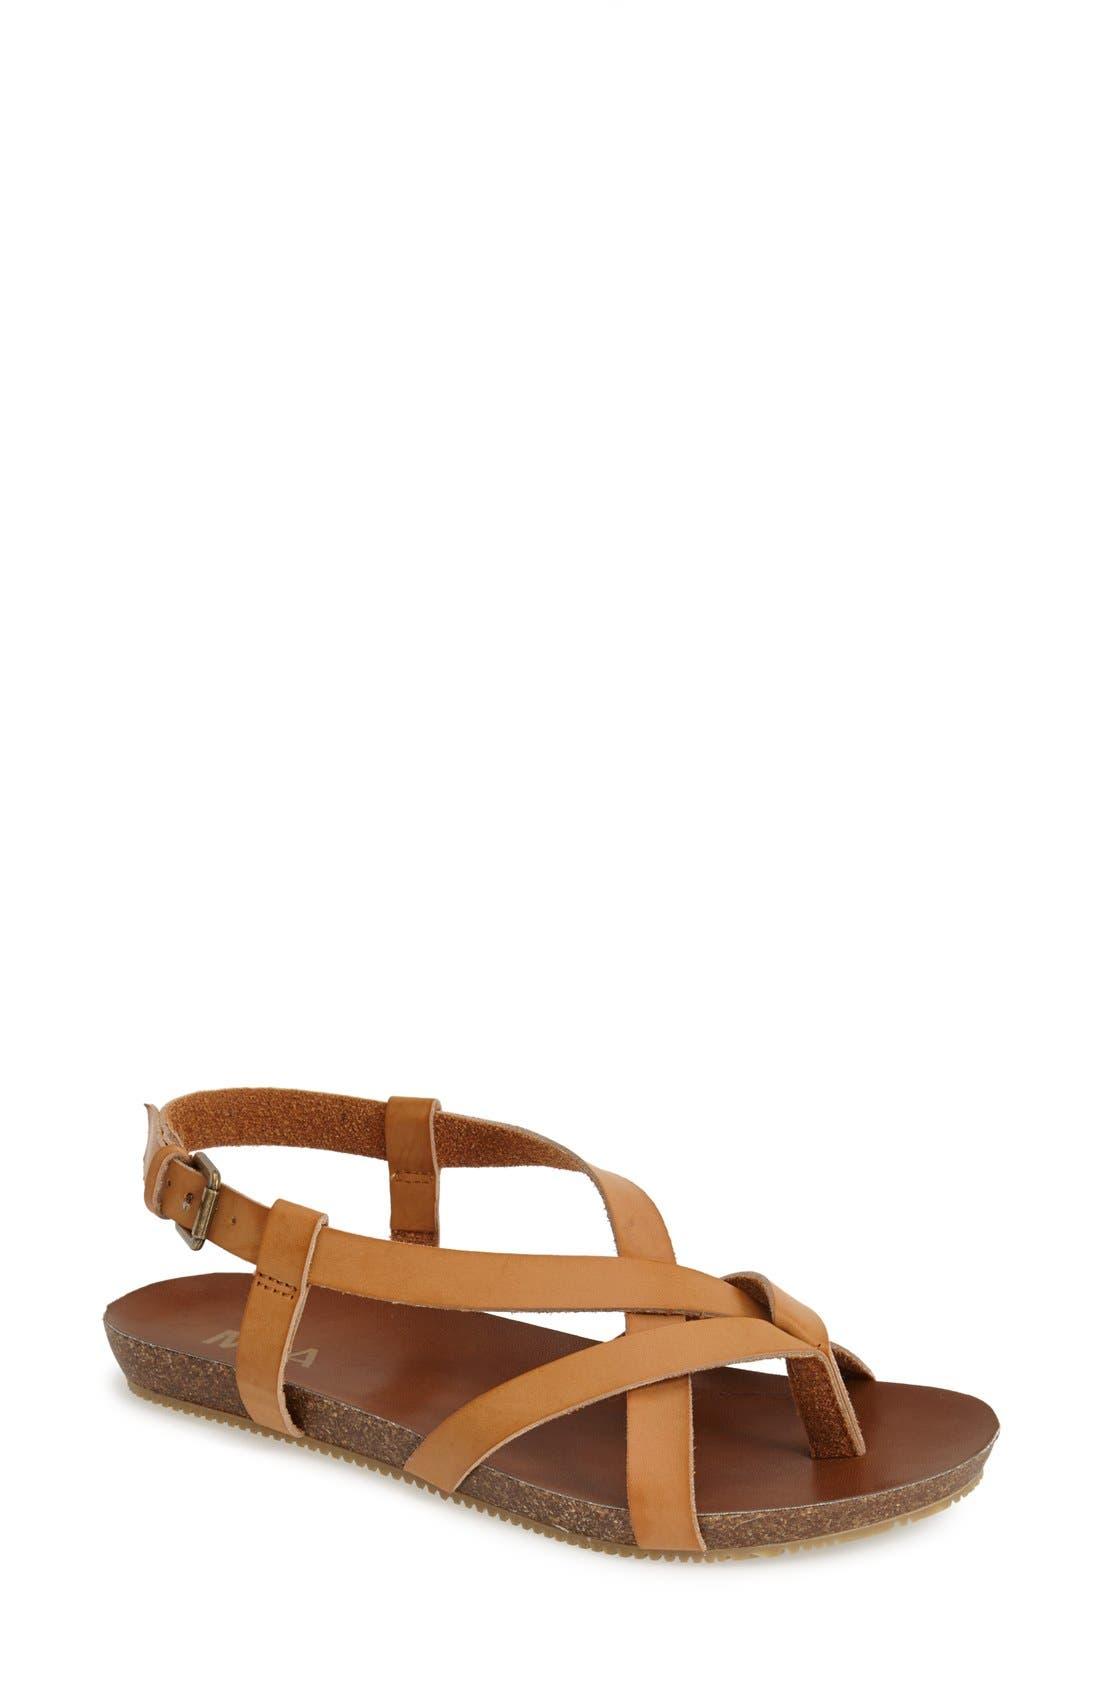 Alternate Image 1 Selected - MIA 'Wildcard' Sandal (Women)